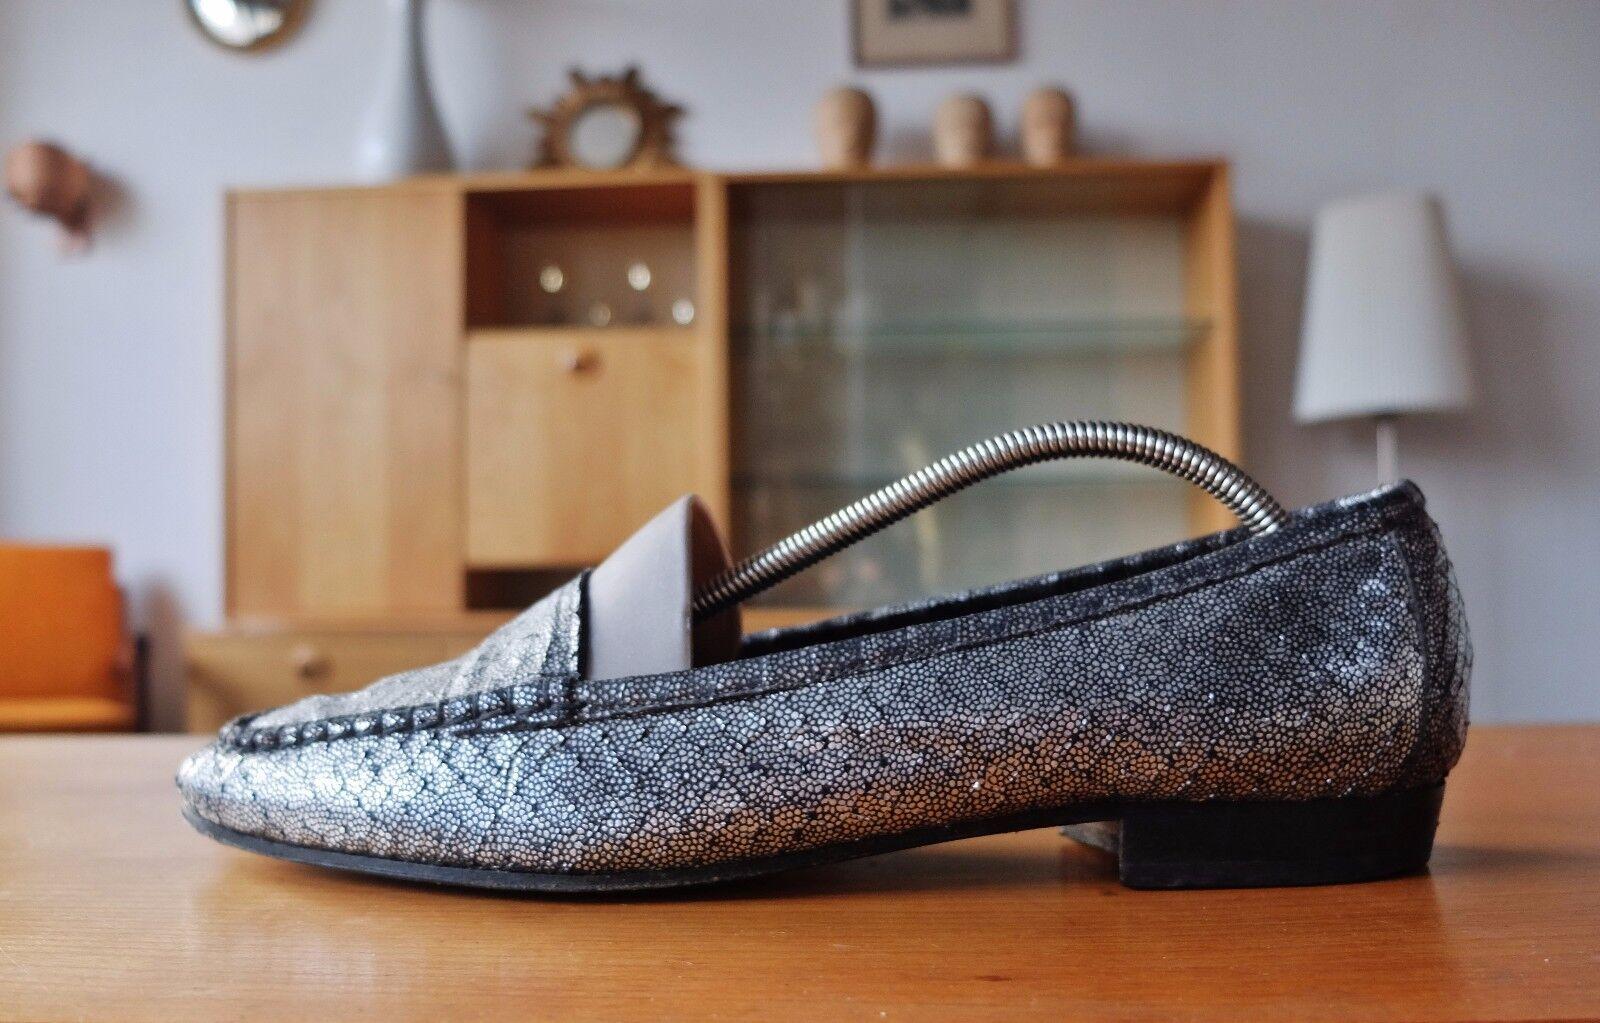 Carriere Carriere Carriere Damen Halbschuh Slipper Textil Schuhe Gr 39,5 UK 6,5 True Vintage 3e89f5